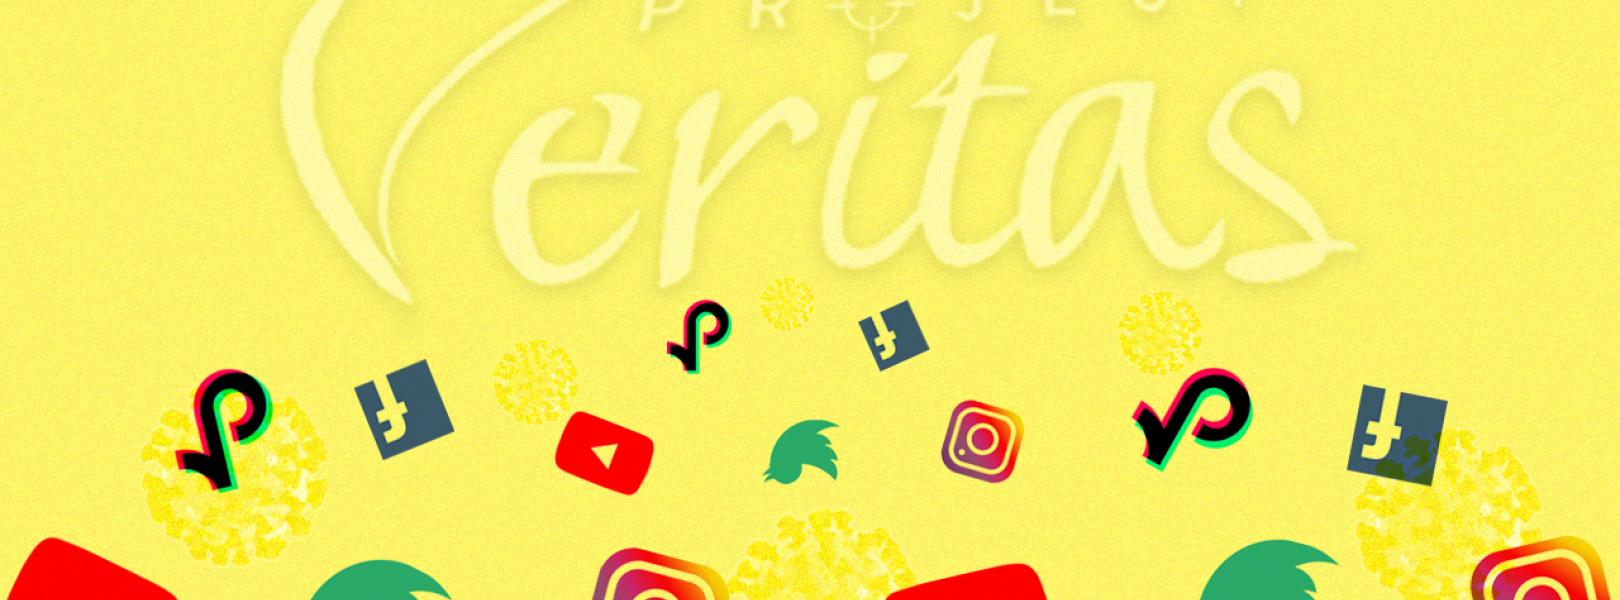 Project veritas_facebook_twitter_tiktok_youtube